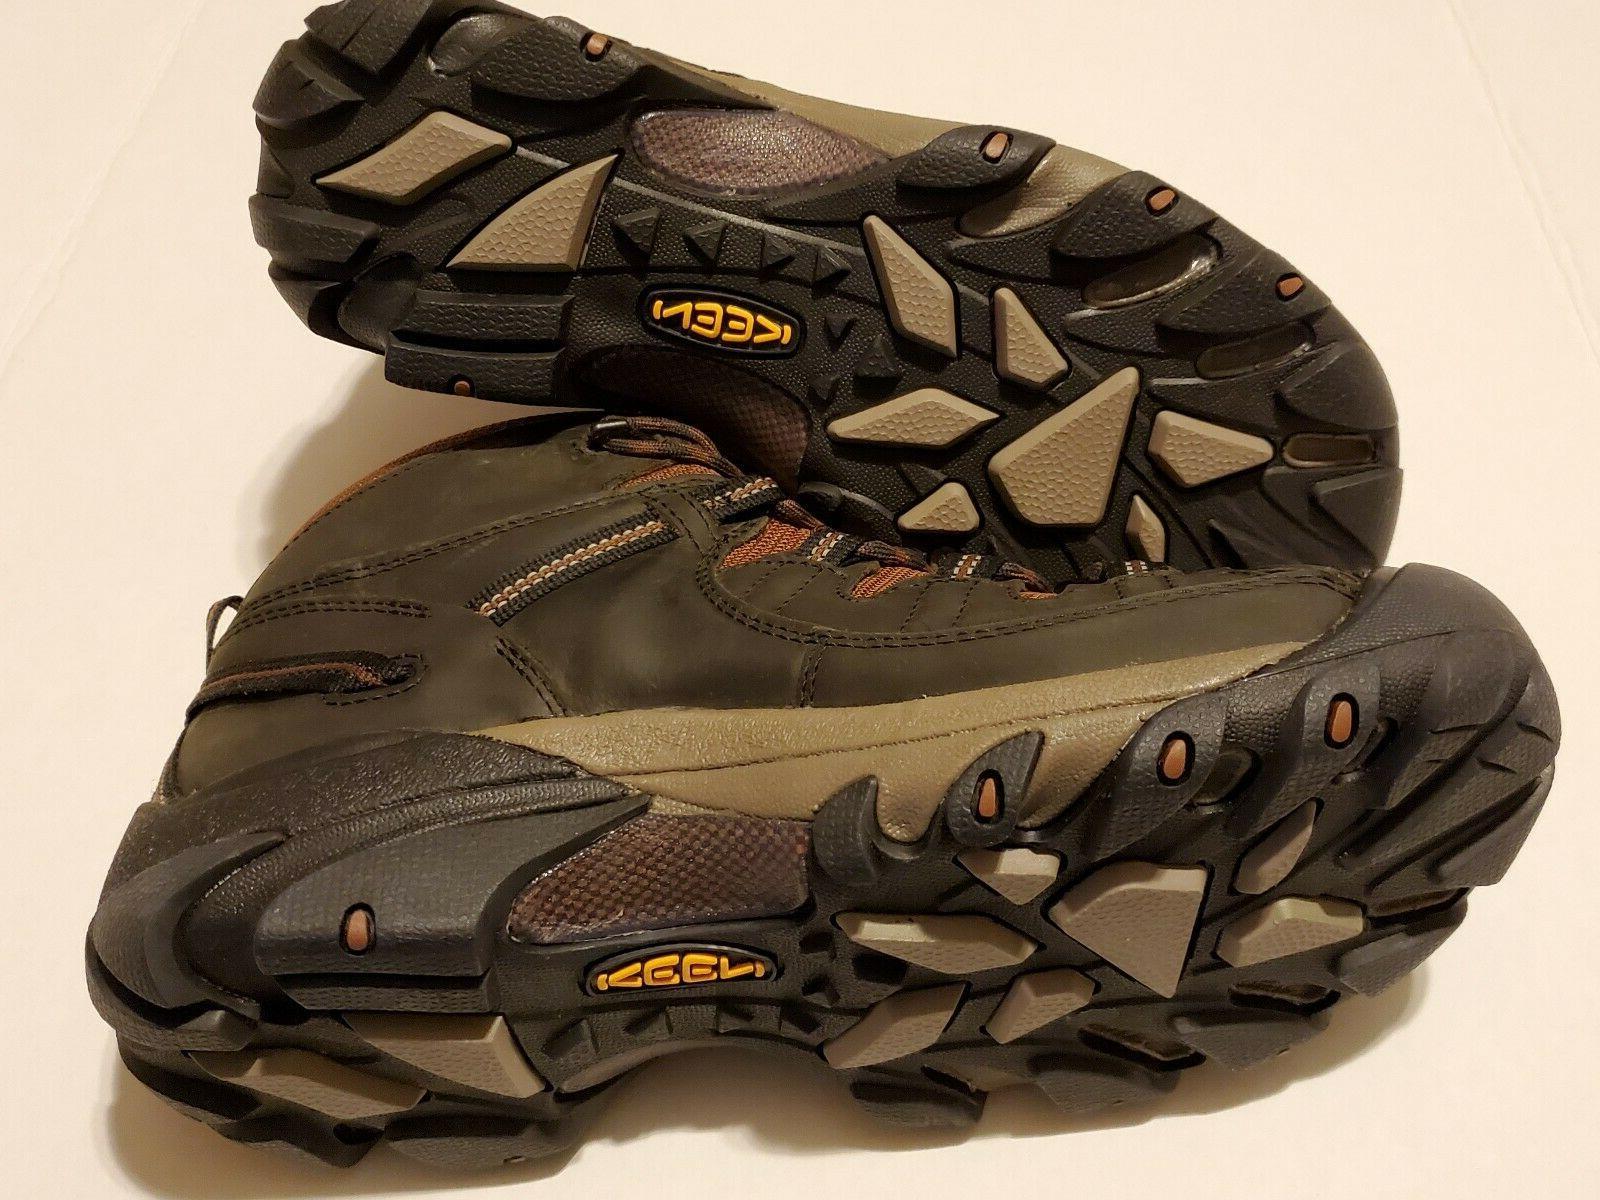 Keen Mid WP Boot Raven/Tortoise MEN'S